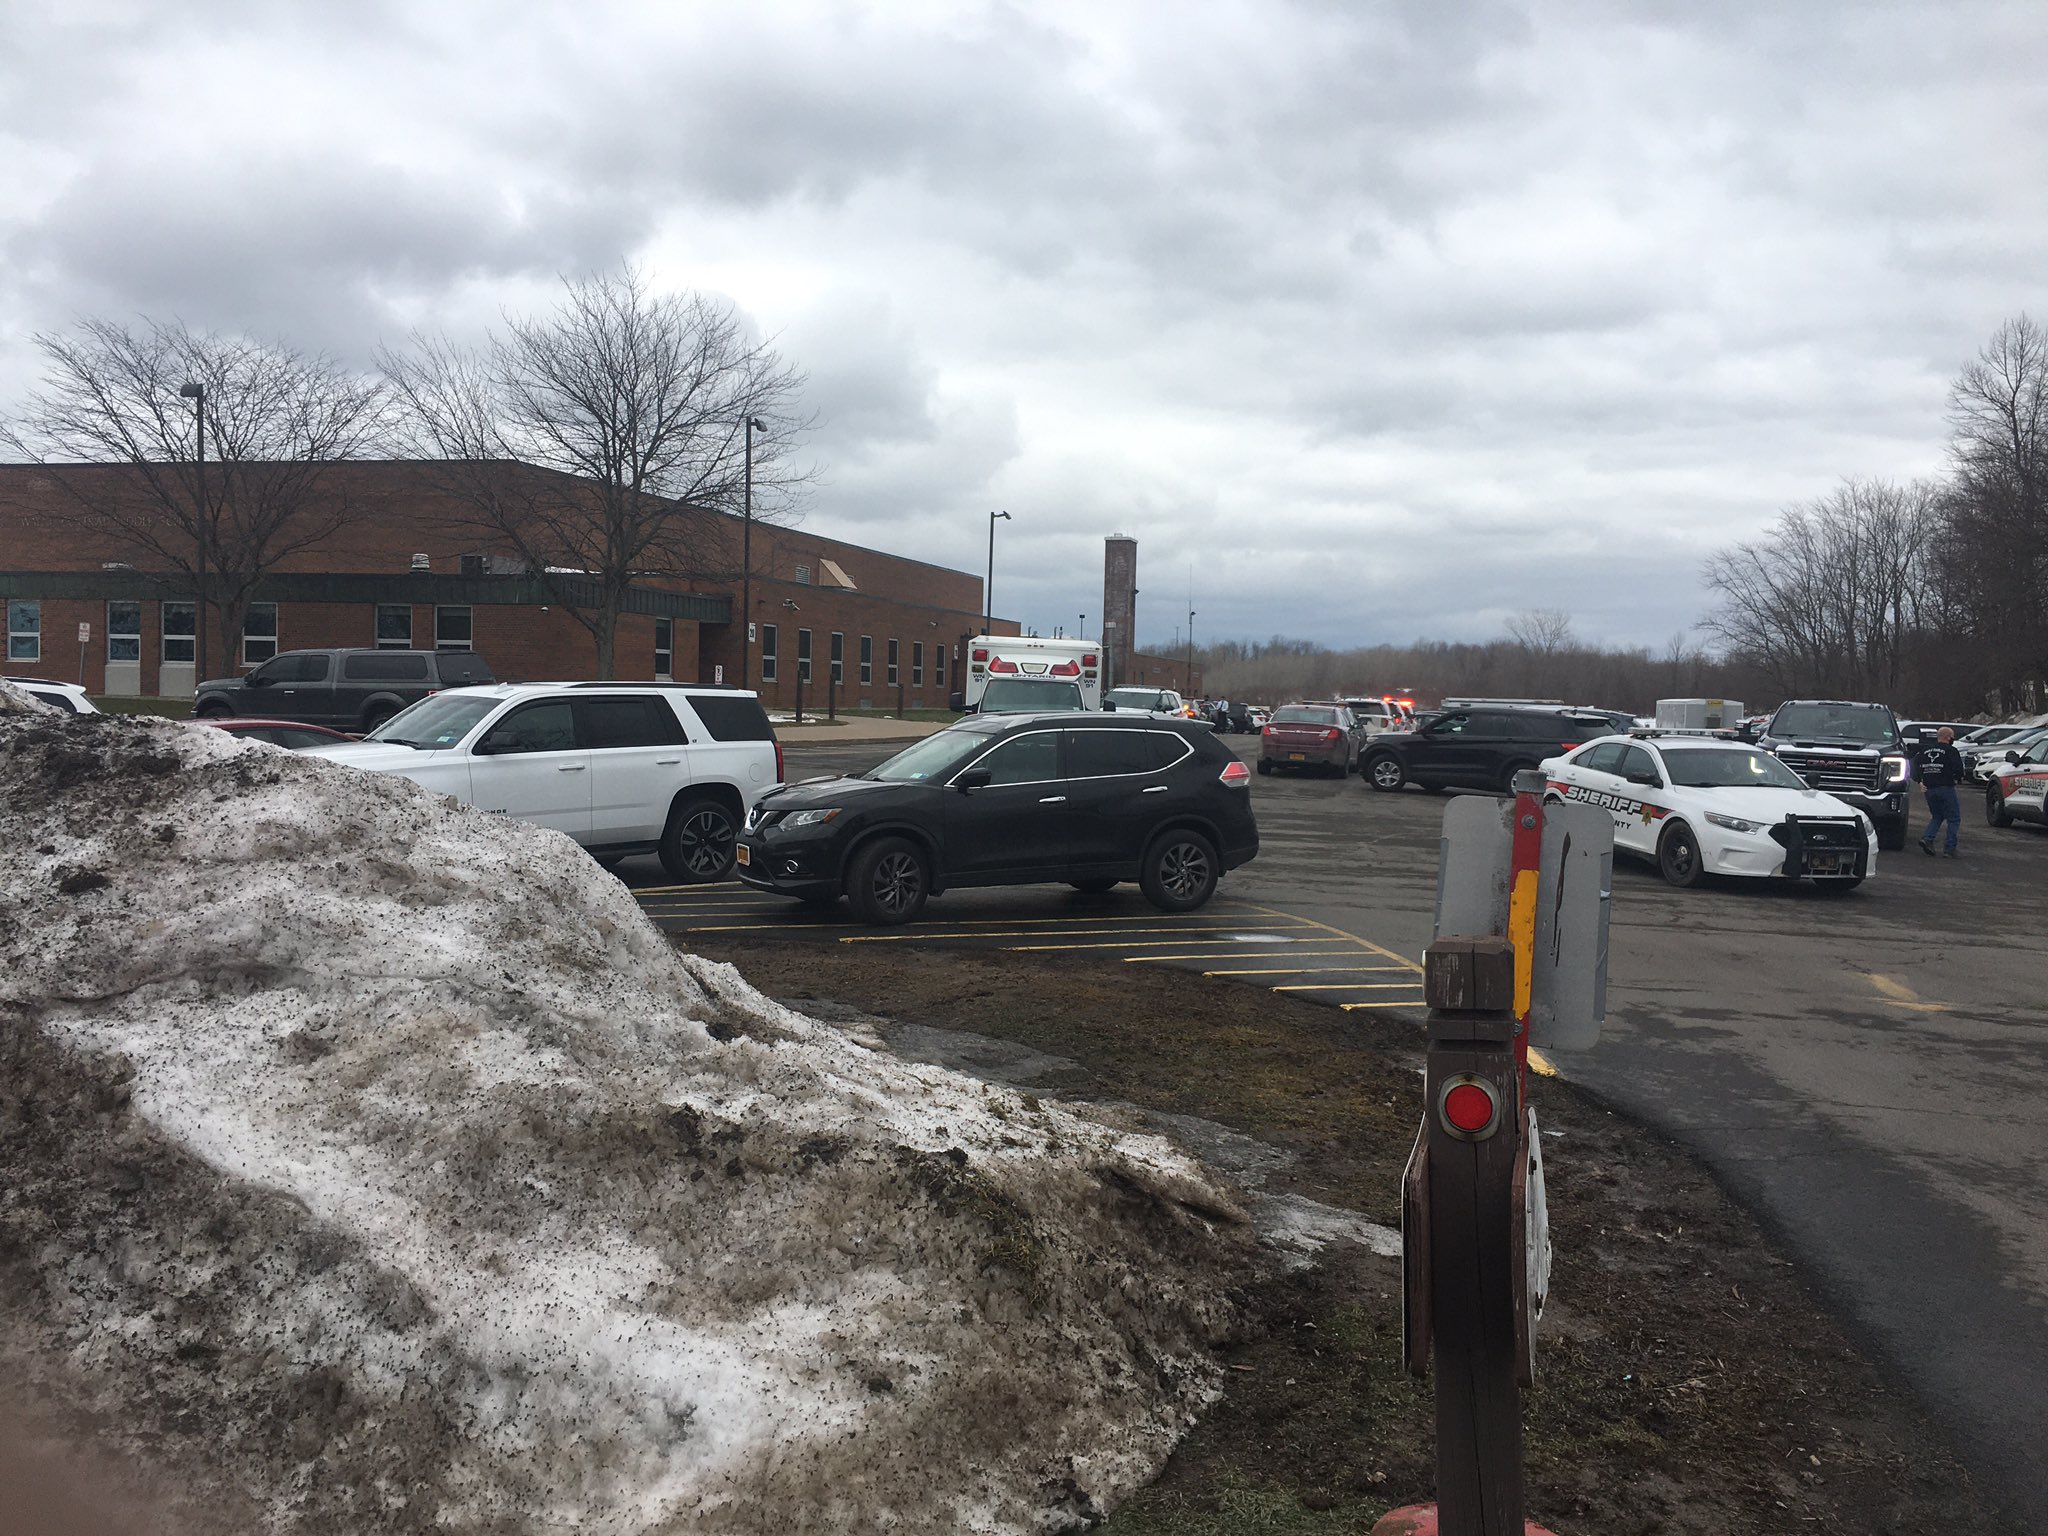 Police investigation underway at Wayne Middle School, resource officer injured